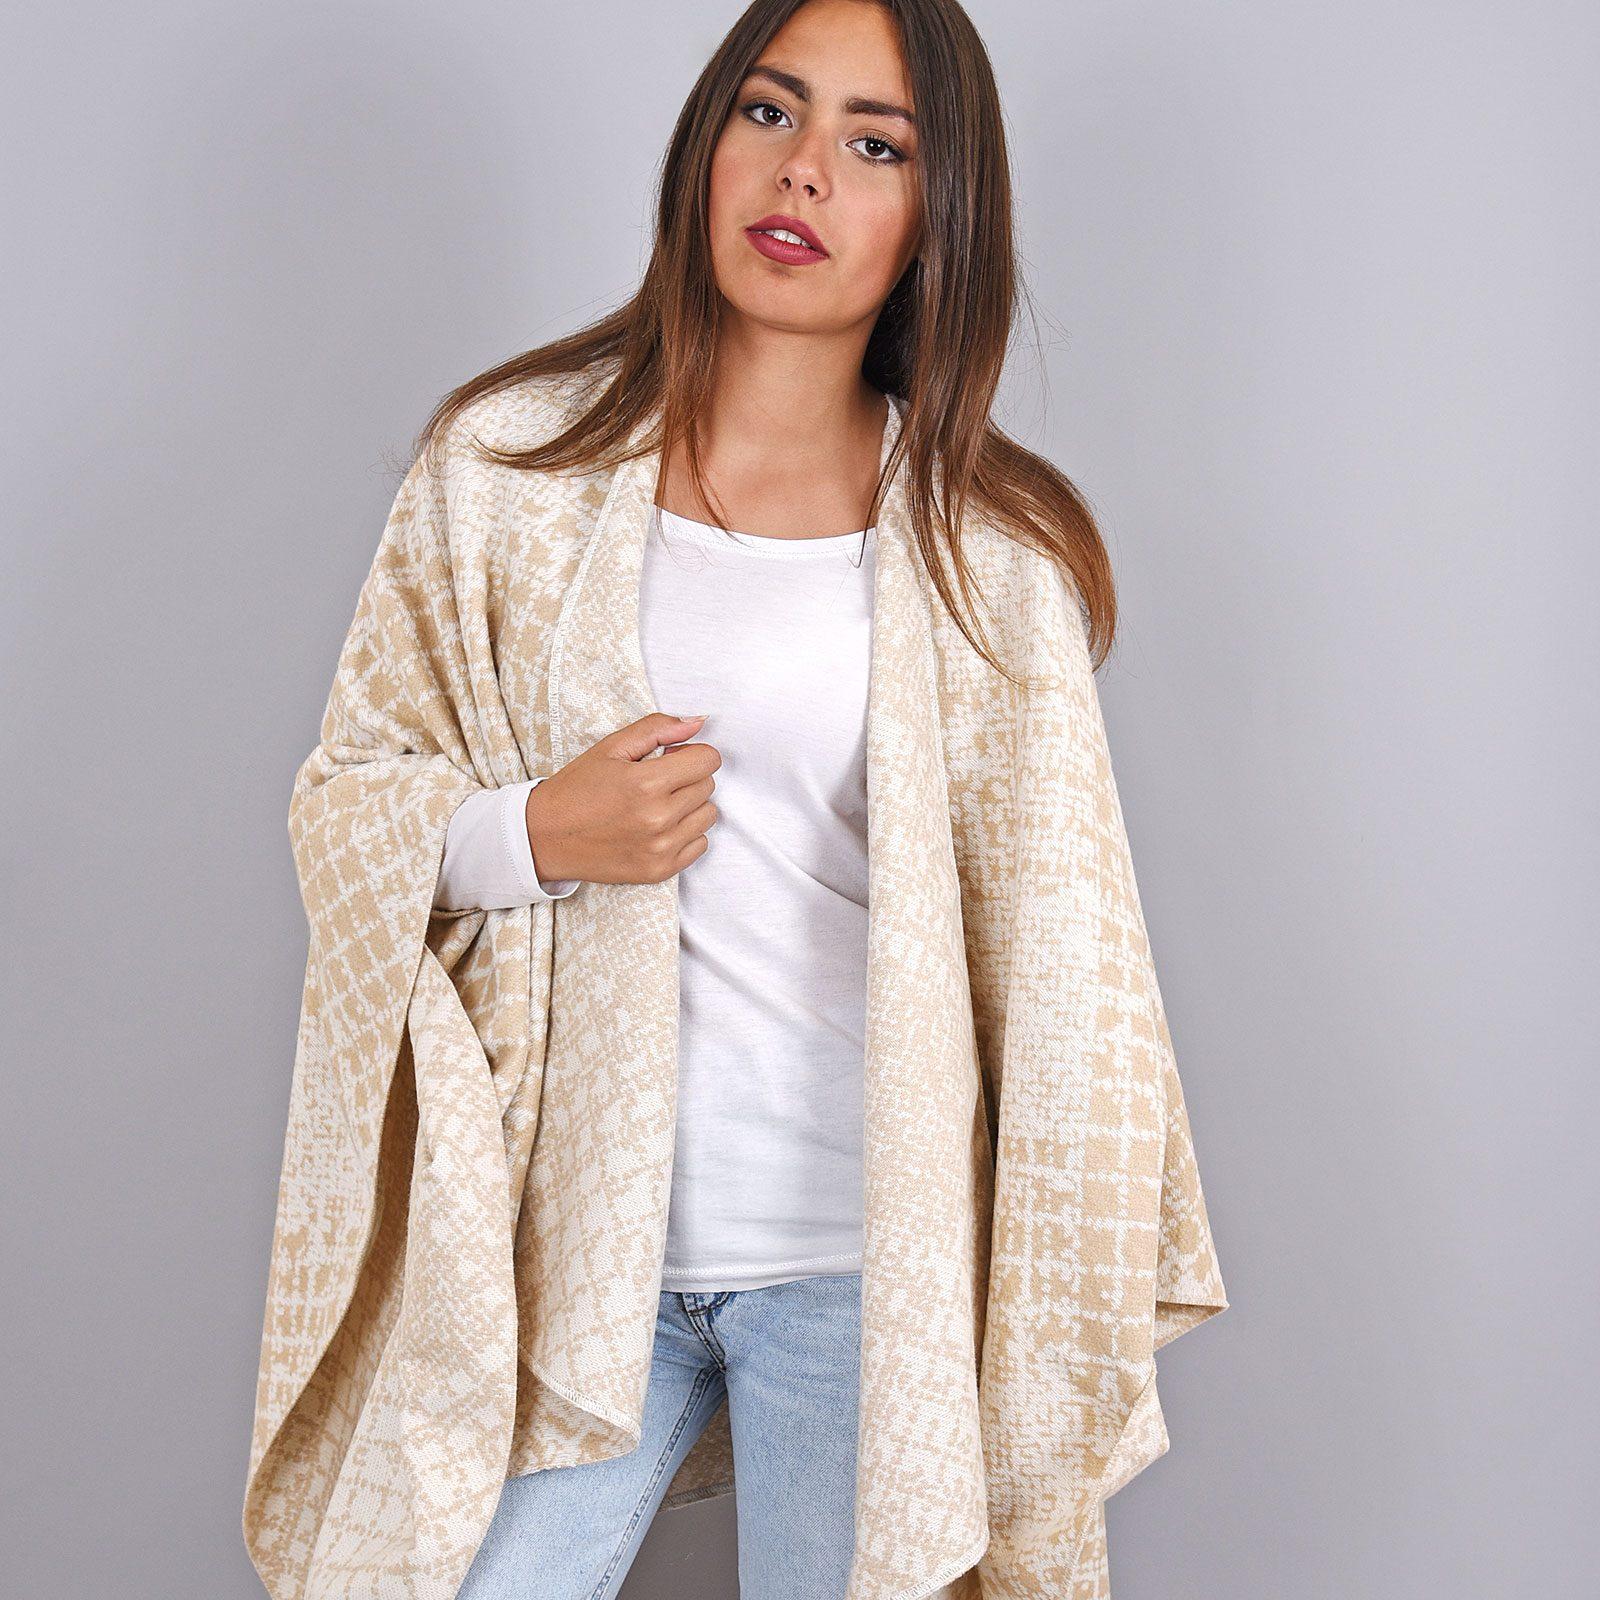 http://lookbook.allee-du-foulard.fr/wp-content/uploads/2019/01/AT-03968-VF16-poncho-hiver-beige-mouchetis-1600x1600.jpg